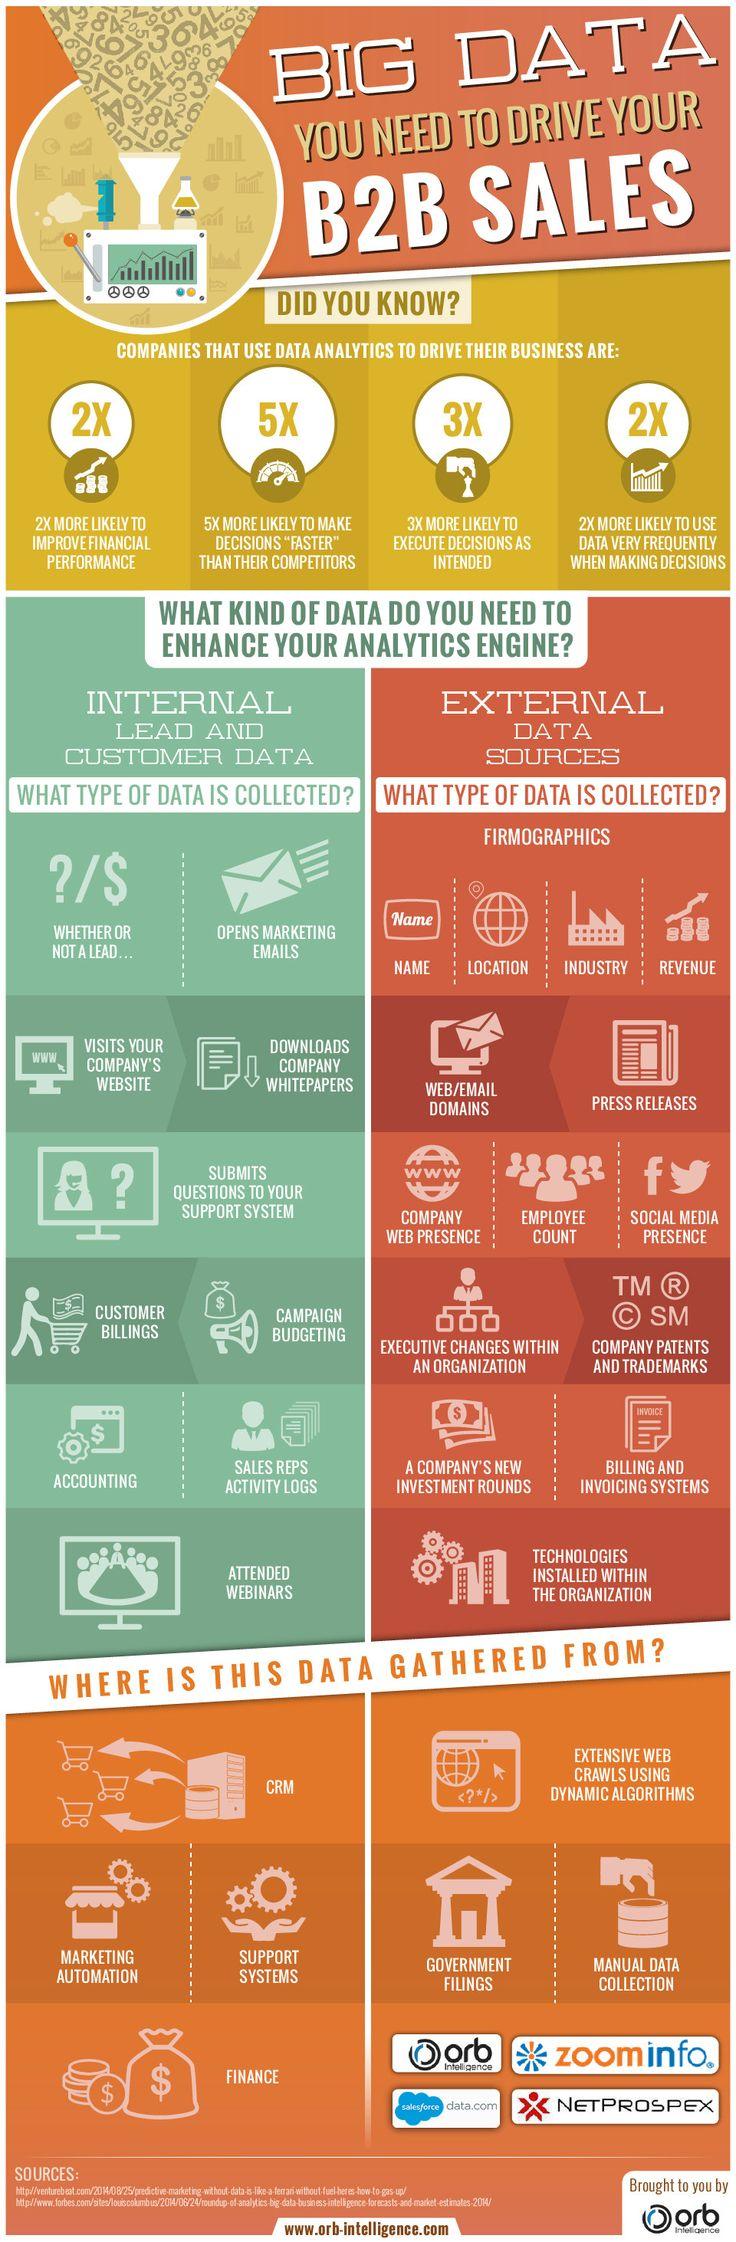 Big Data You Need to Drive Your B2B Sales    ⏩ Check out Pranav Sharma on Twitter @HereIsPranav